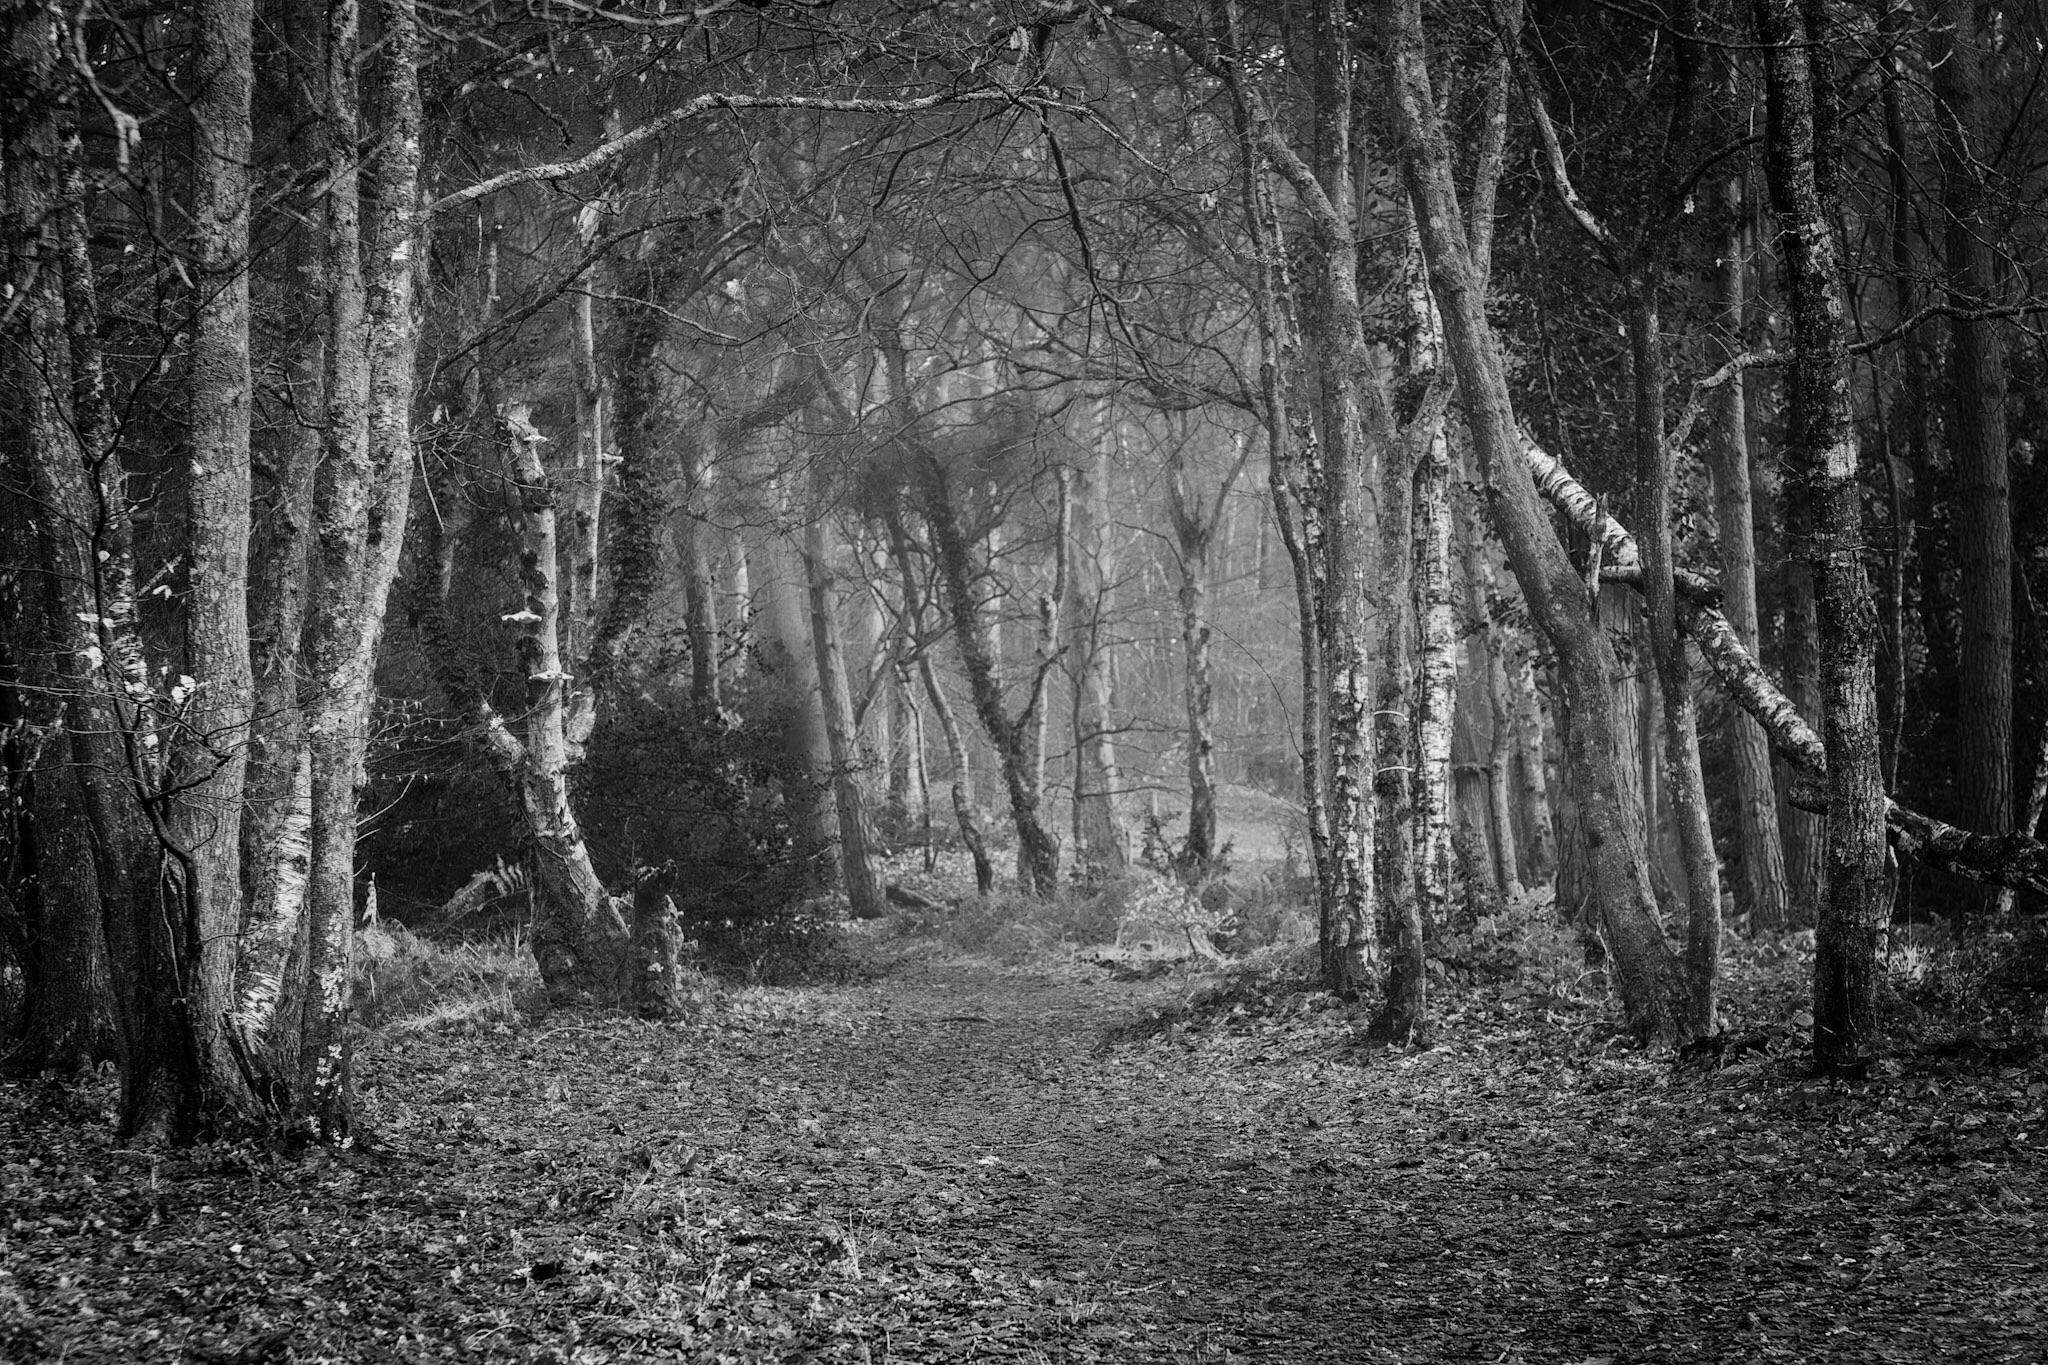 Landscape photography in Dorset by Rick McEvoy